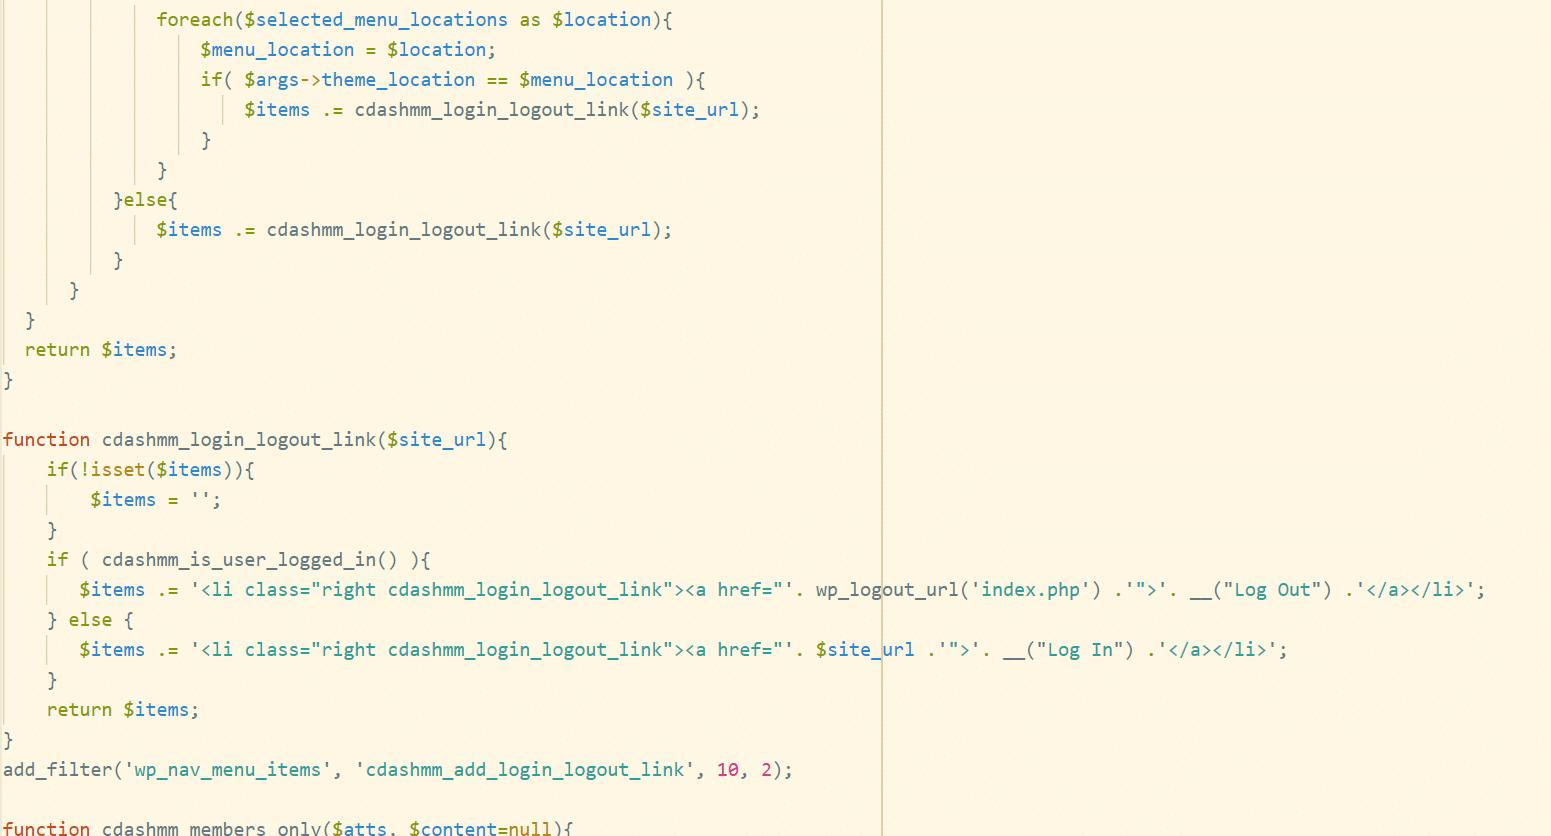 Adding a login/logout link to WordPress Menu